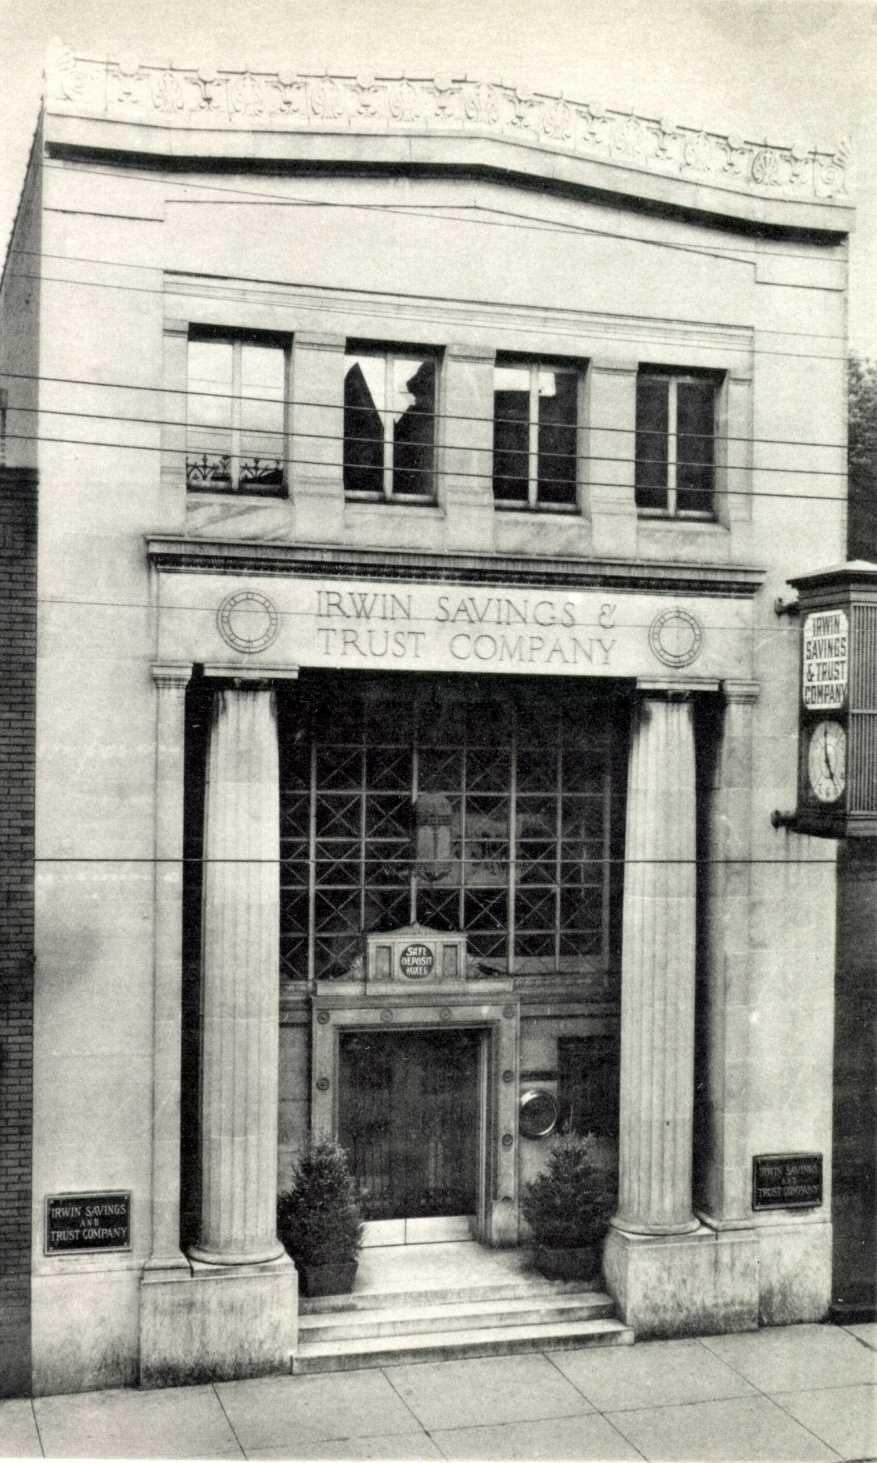 1939: Irwin Savings and Trust Co. on Main Street